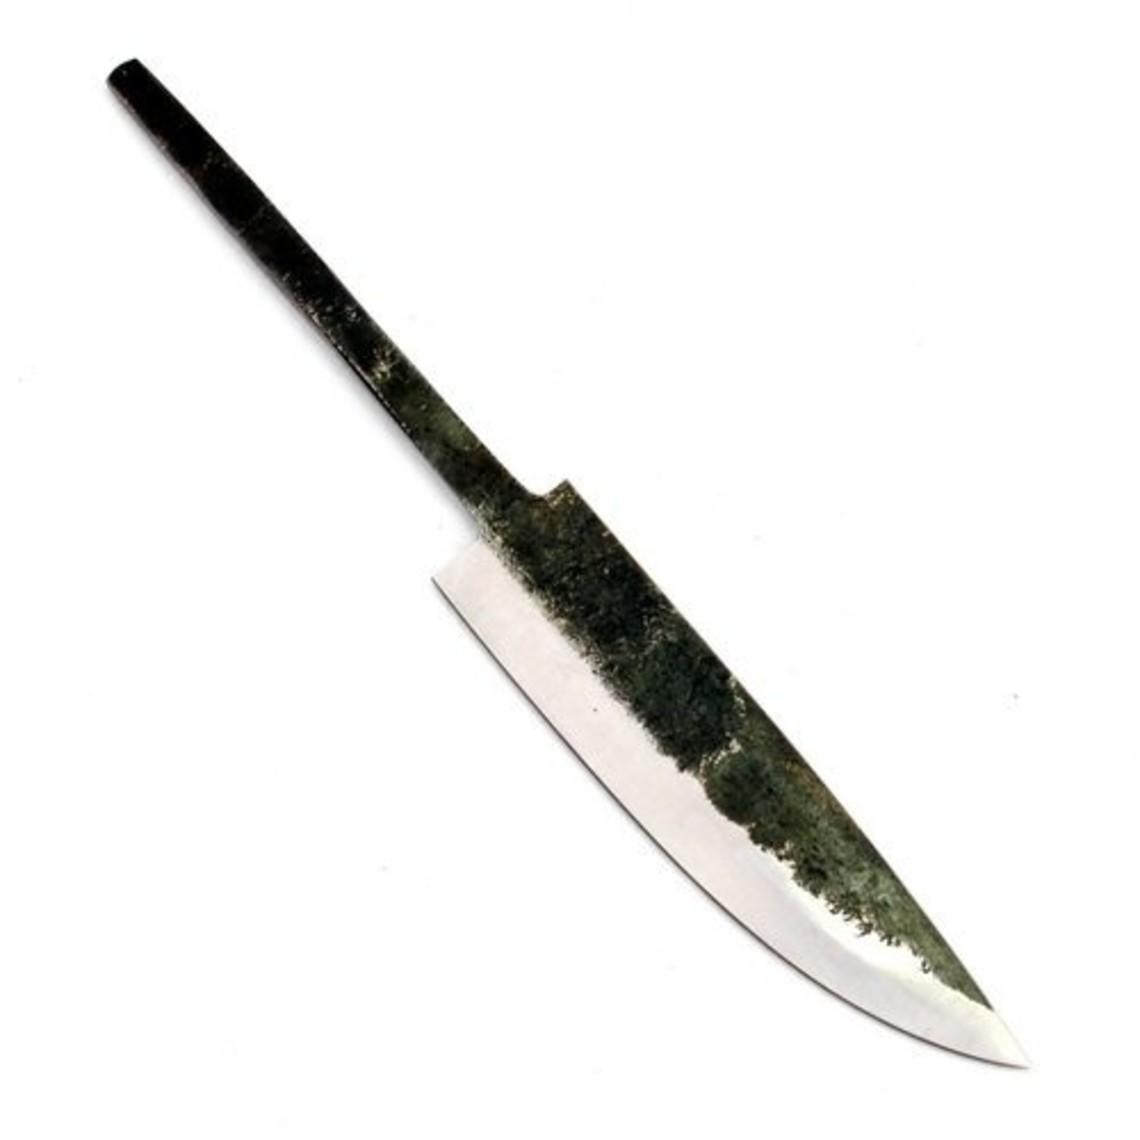 Knife blade 16 cm